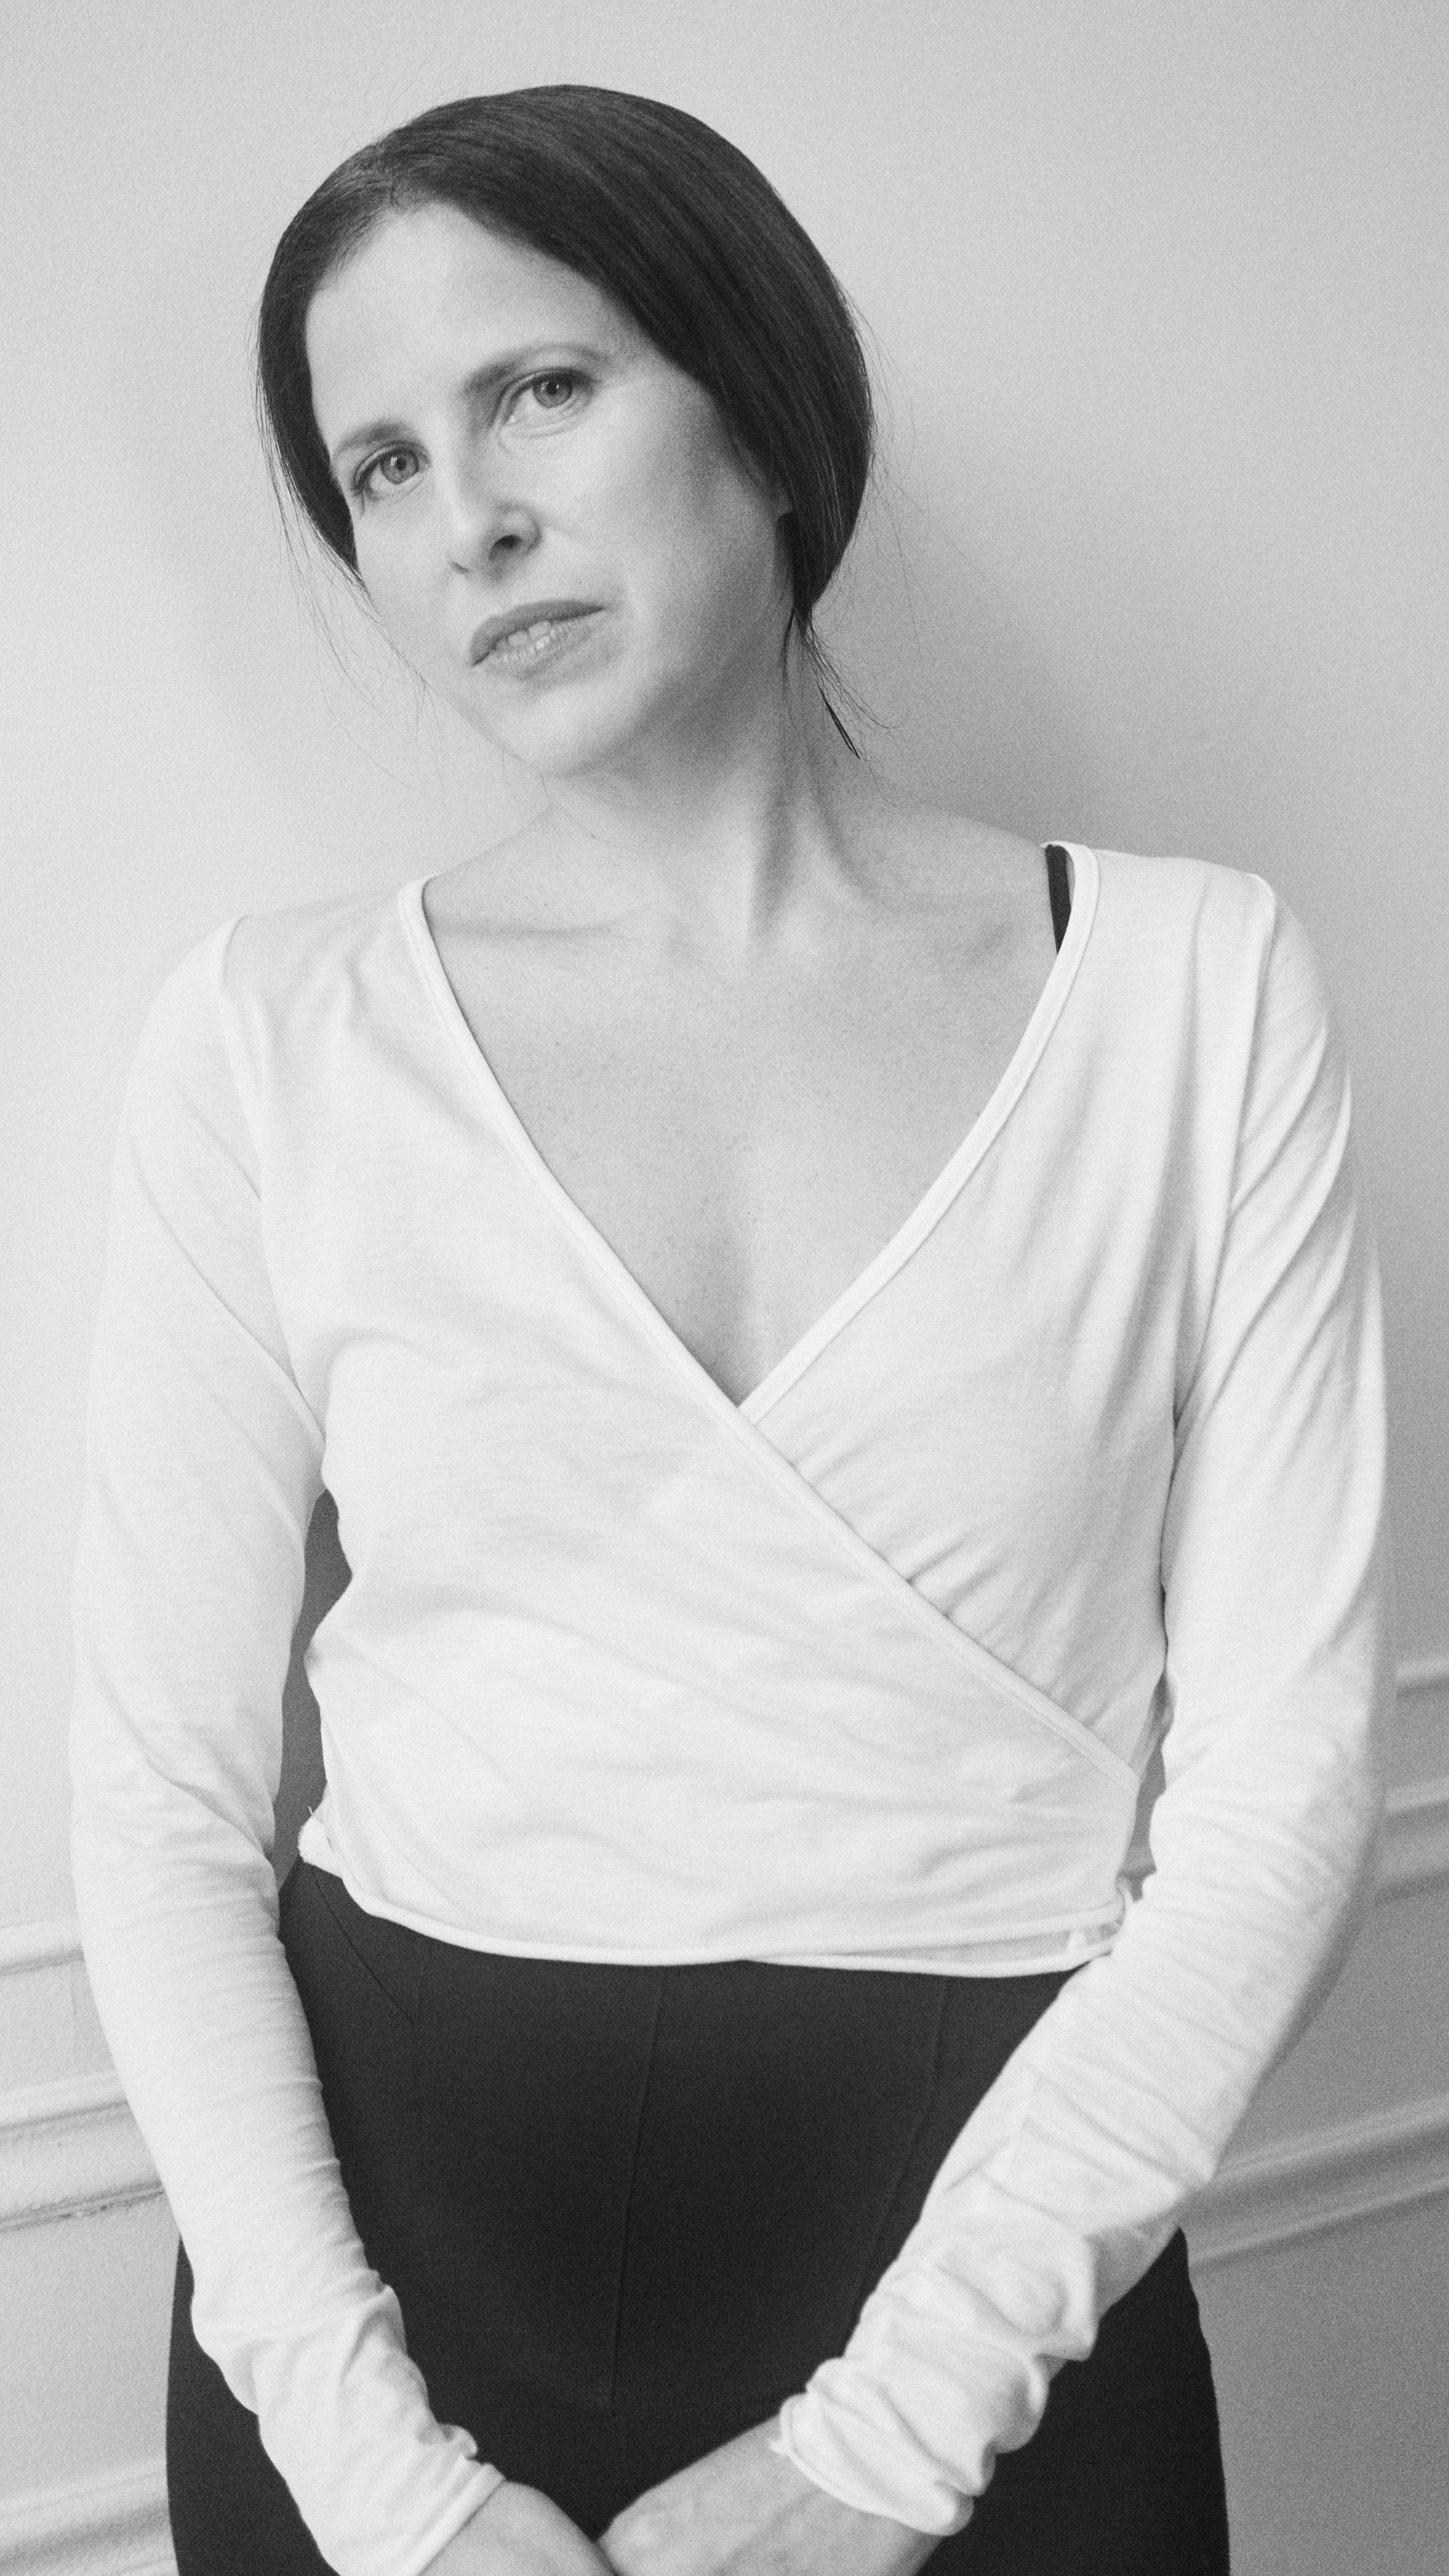 Robyn Berkley